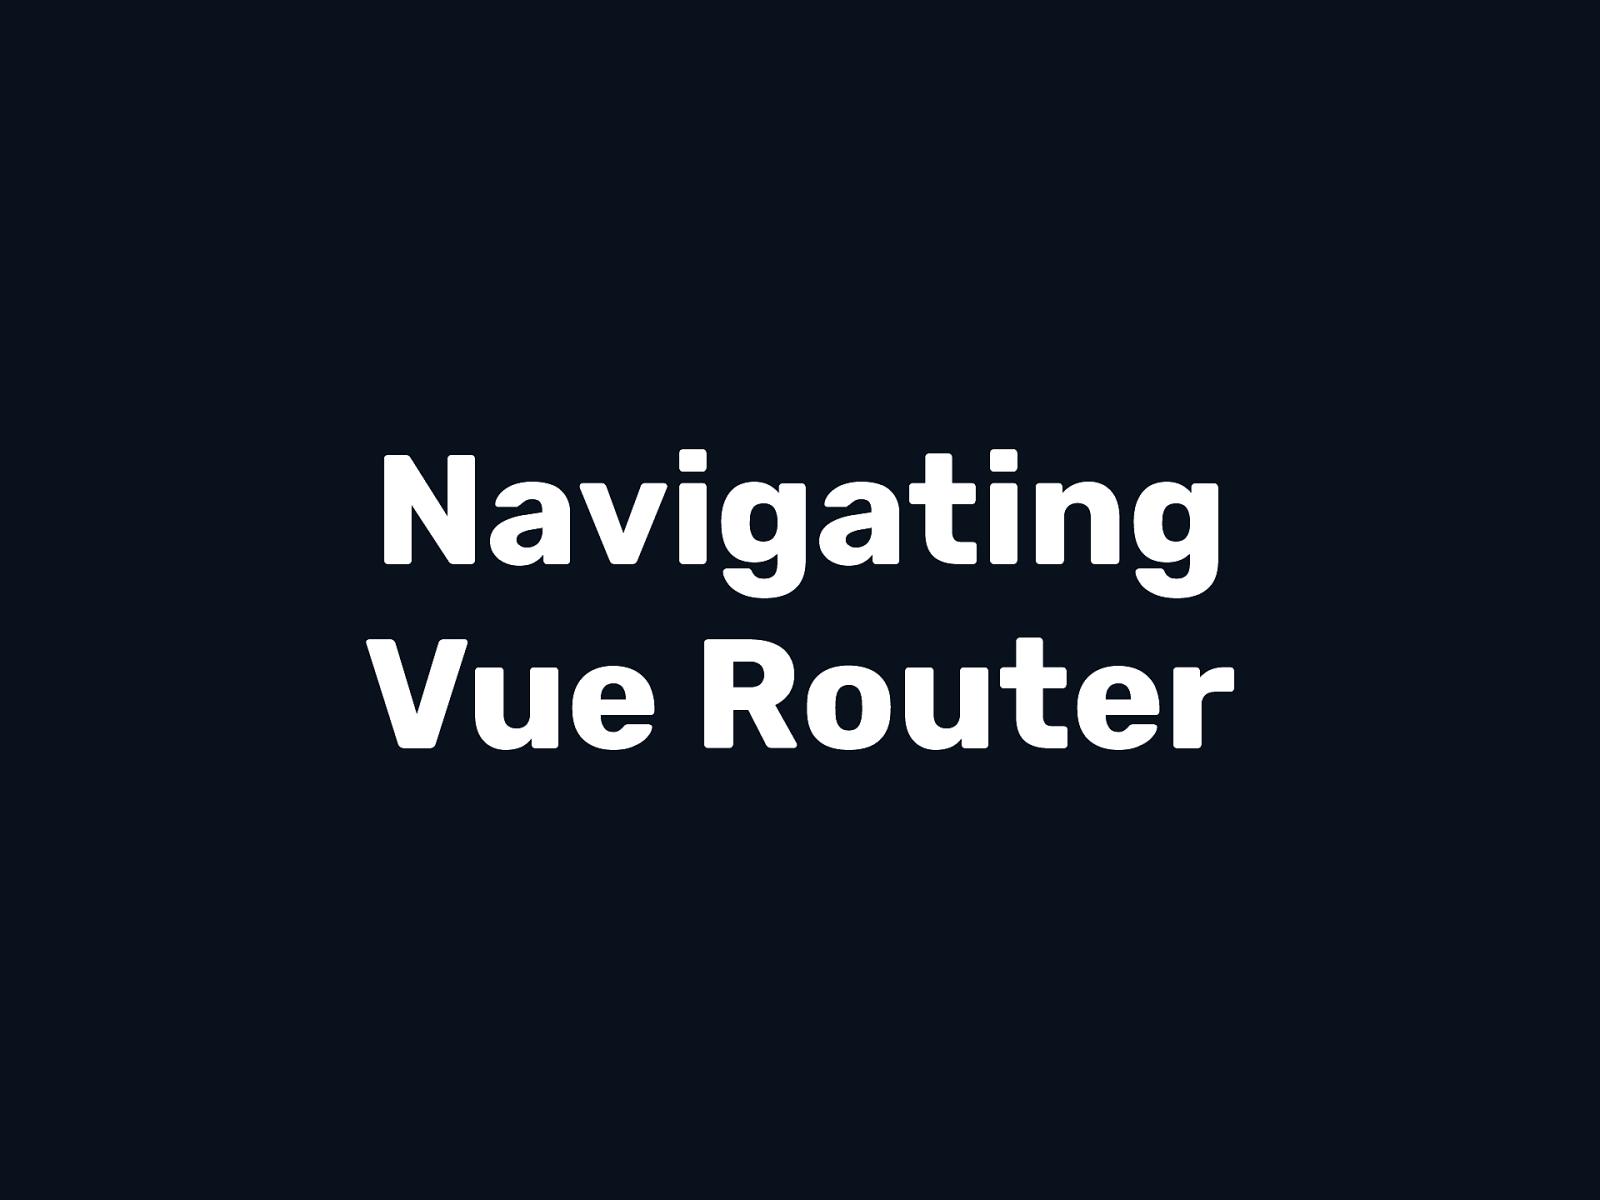 Navigating Vue Router